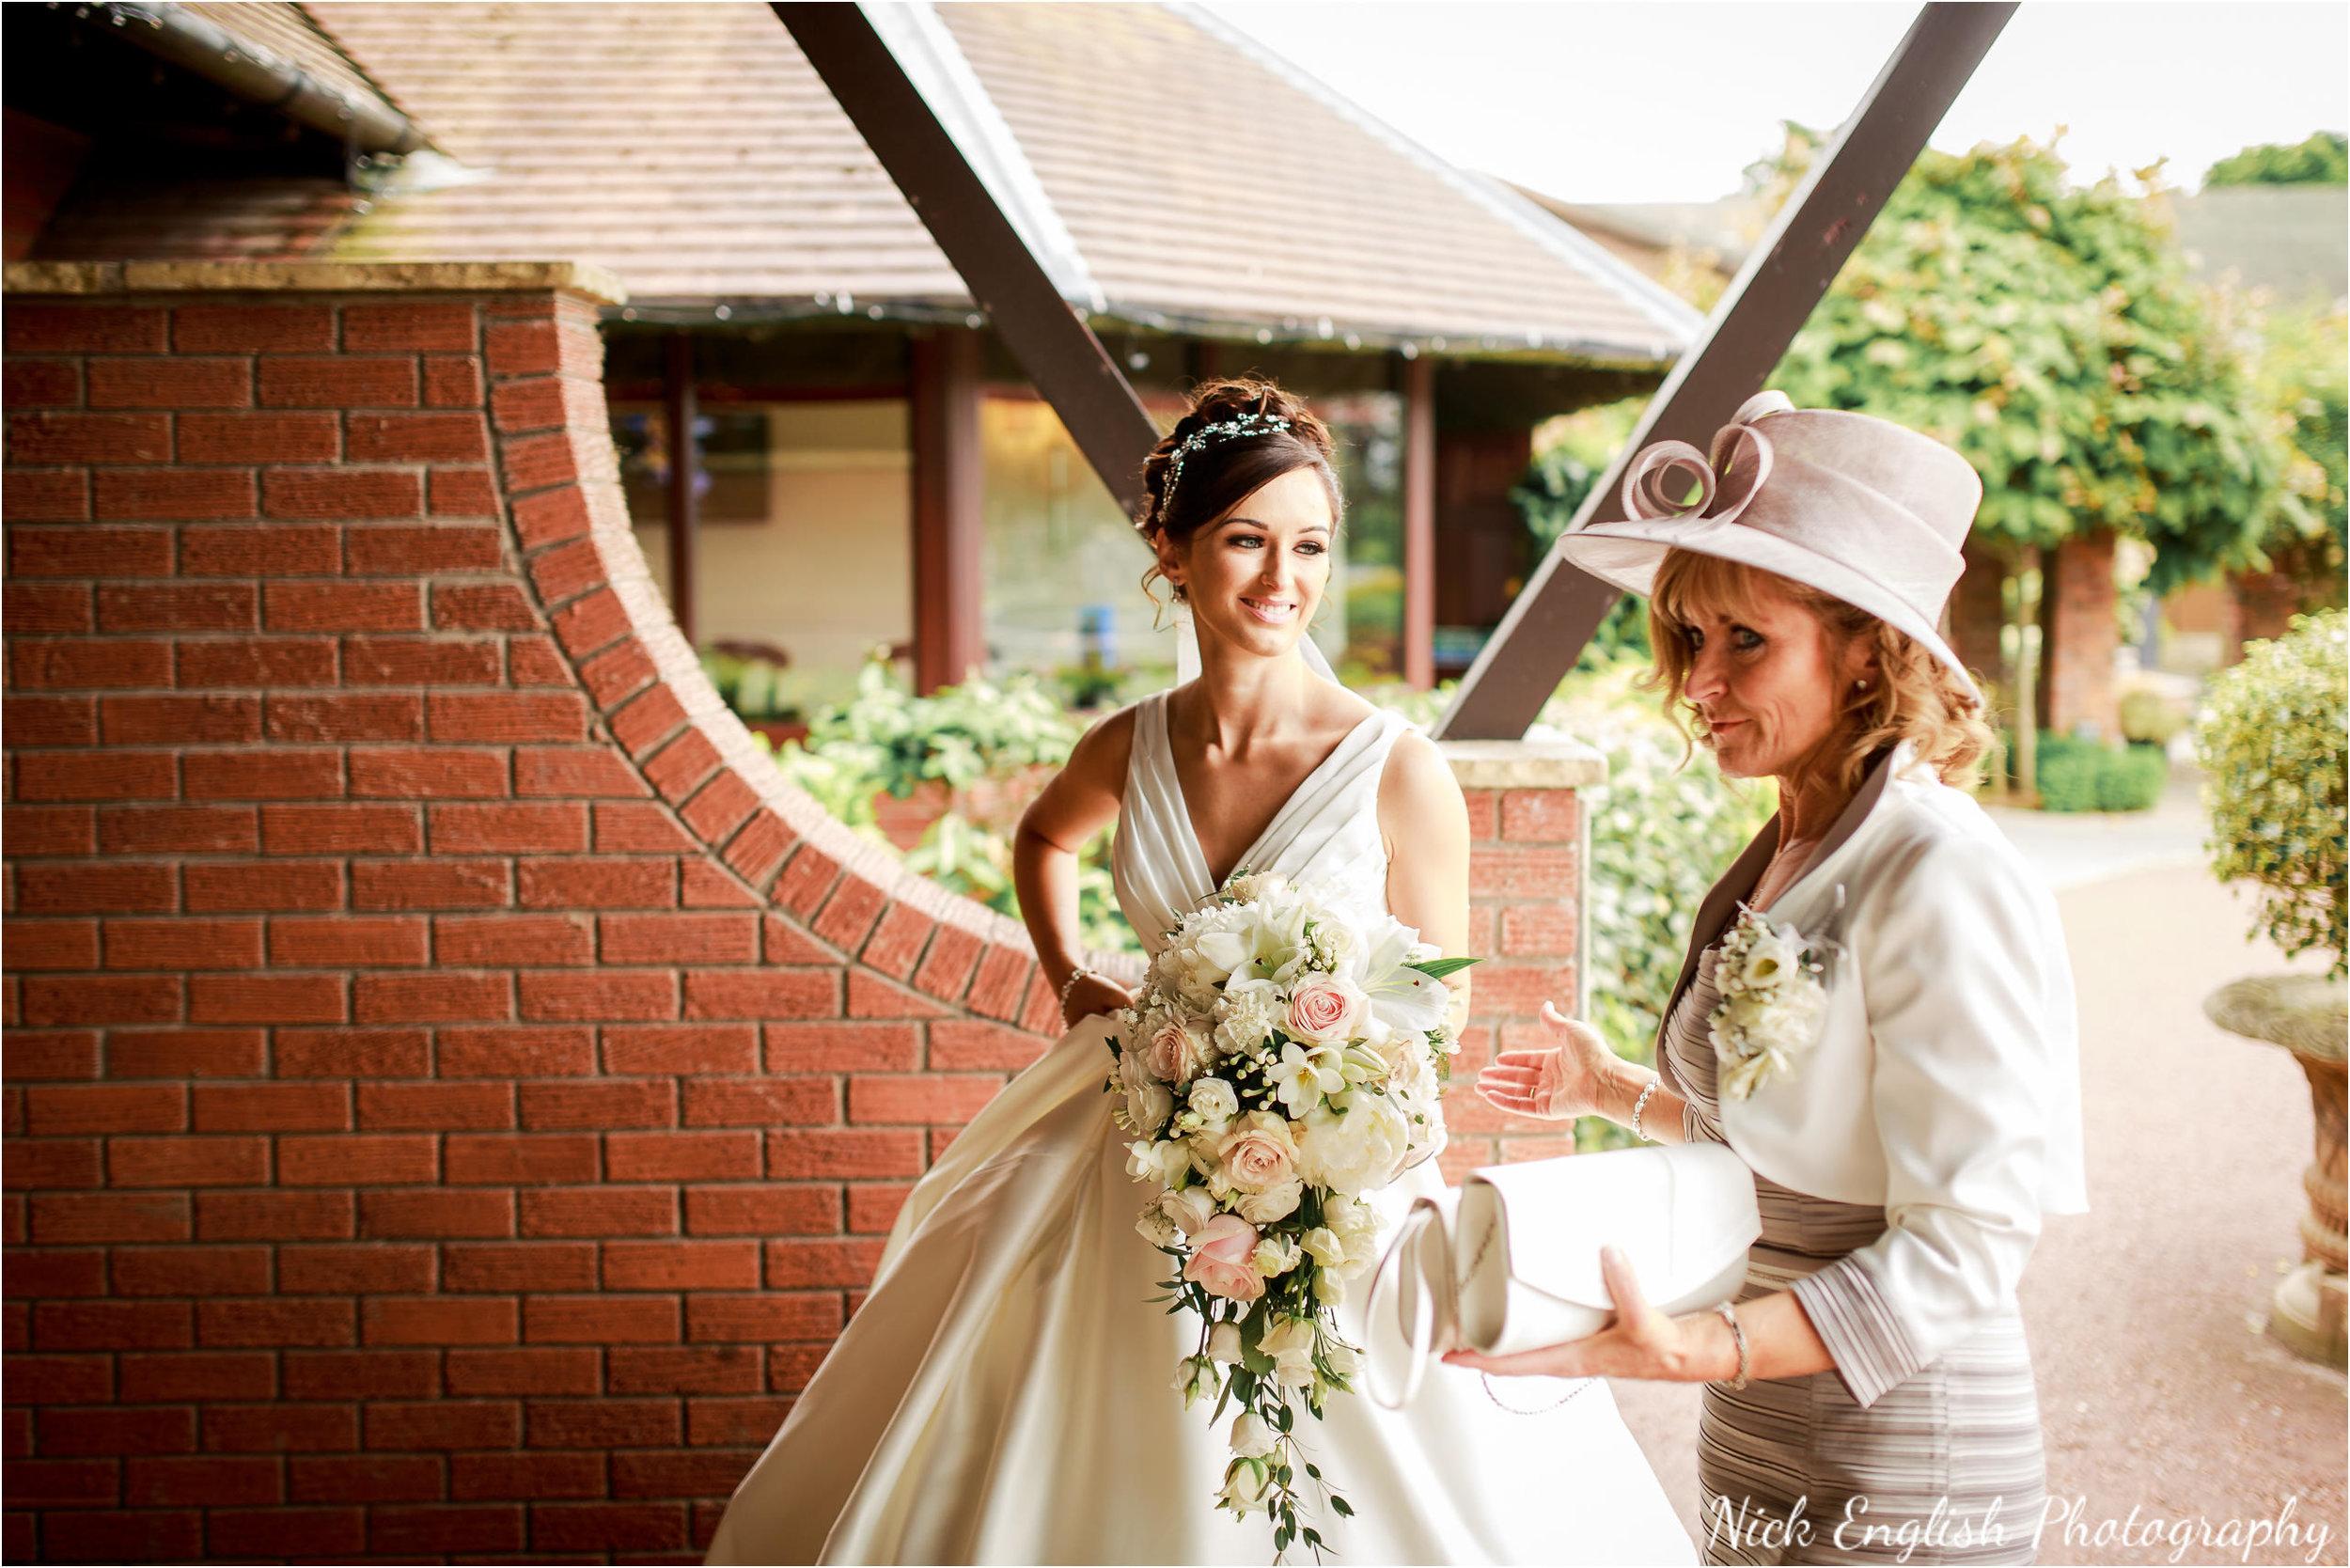 Emily David Wedding Photographs at Barton Grange Preston by Nick English Photography 51jpg.jpeg